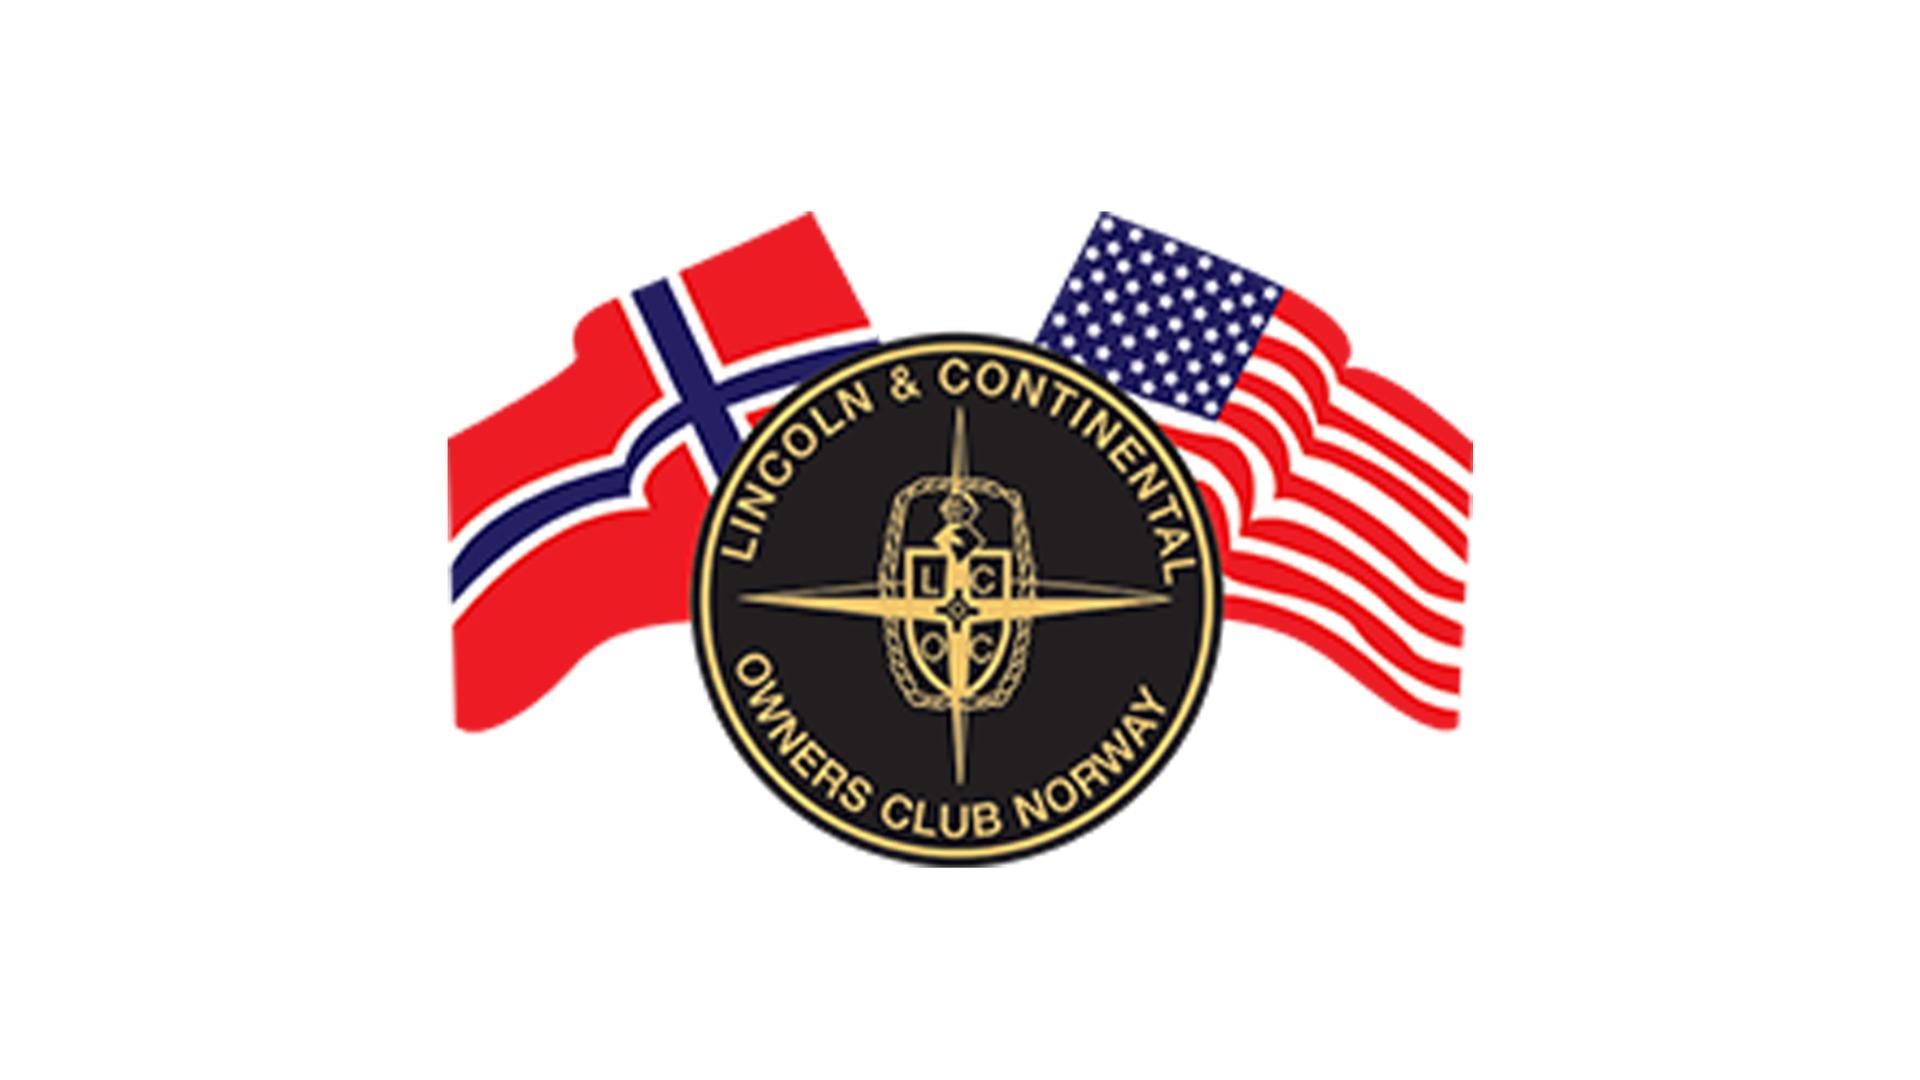 Lincoln+continental+owners+club+of+norway-Fullskjerm.jpg